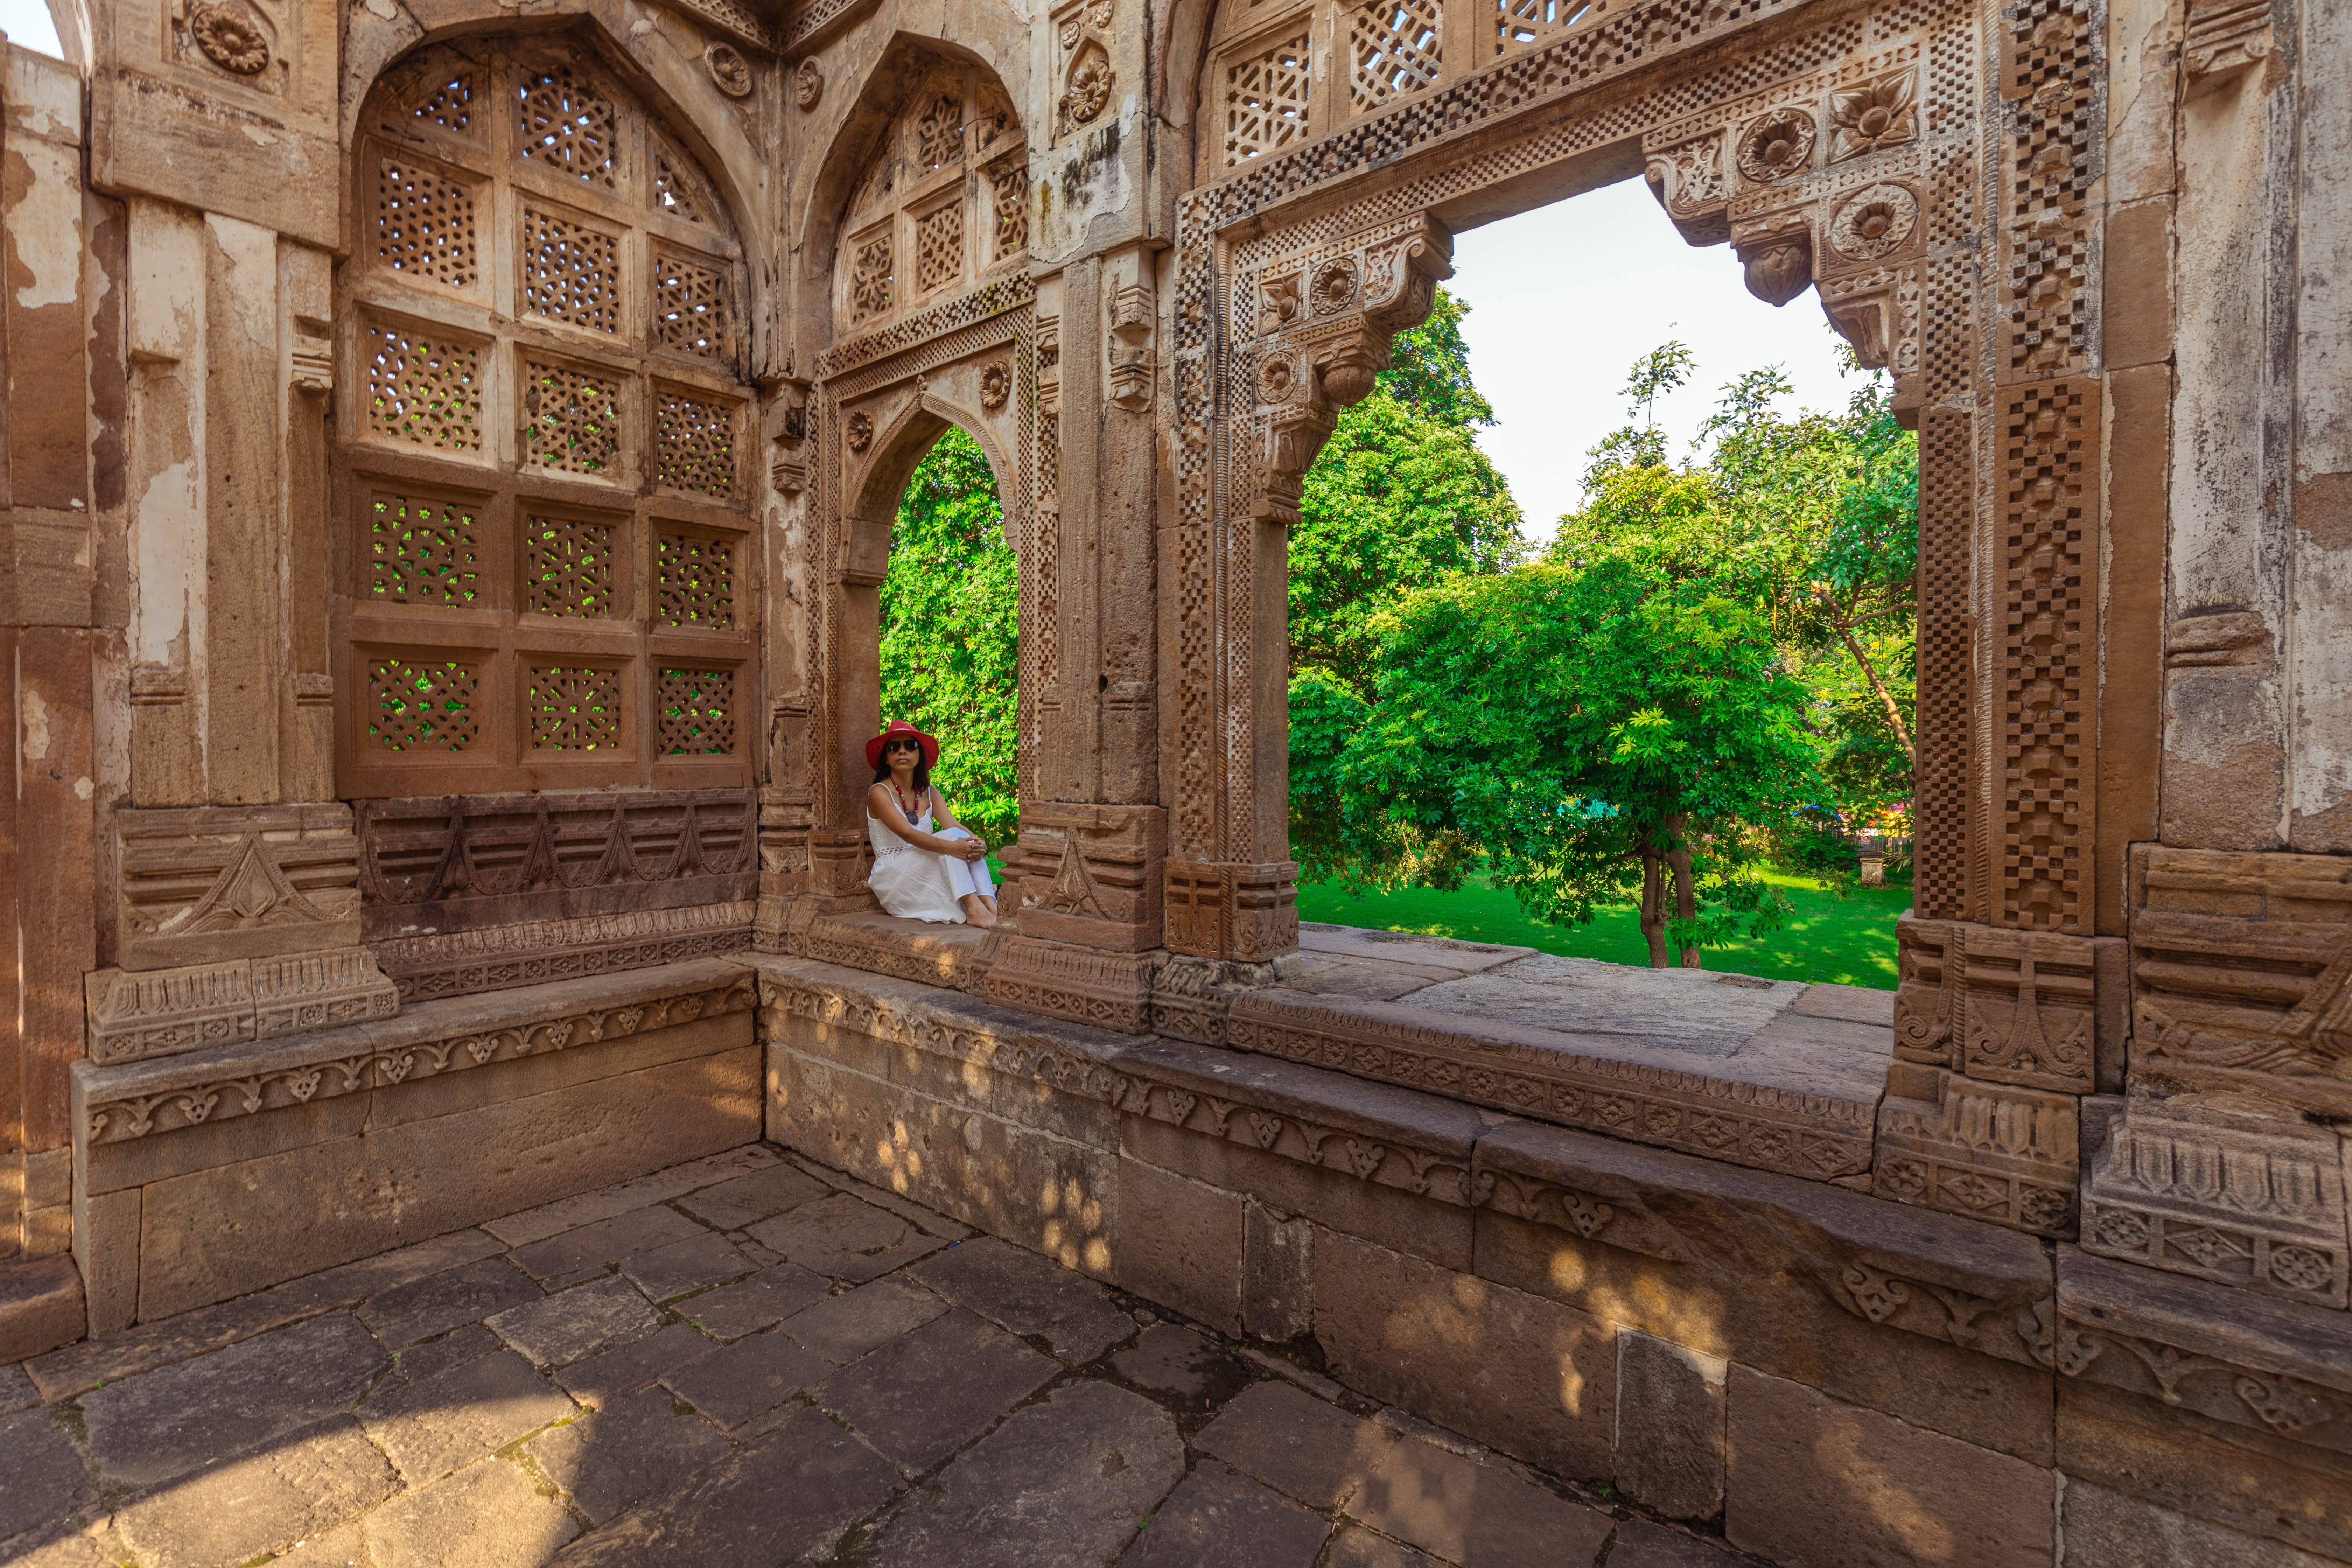 Jami Masjid of Champaner, Gujarat reflects the Islamic-Mughal architecture of Gujarat